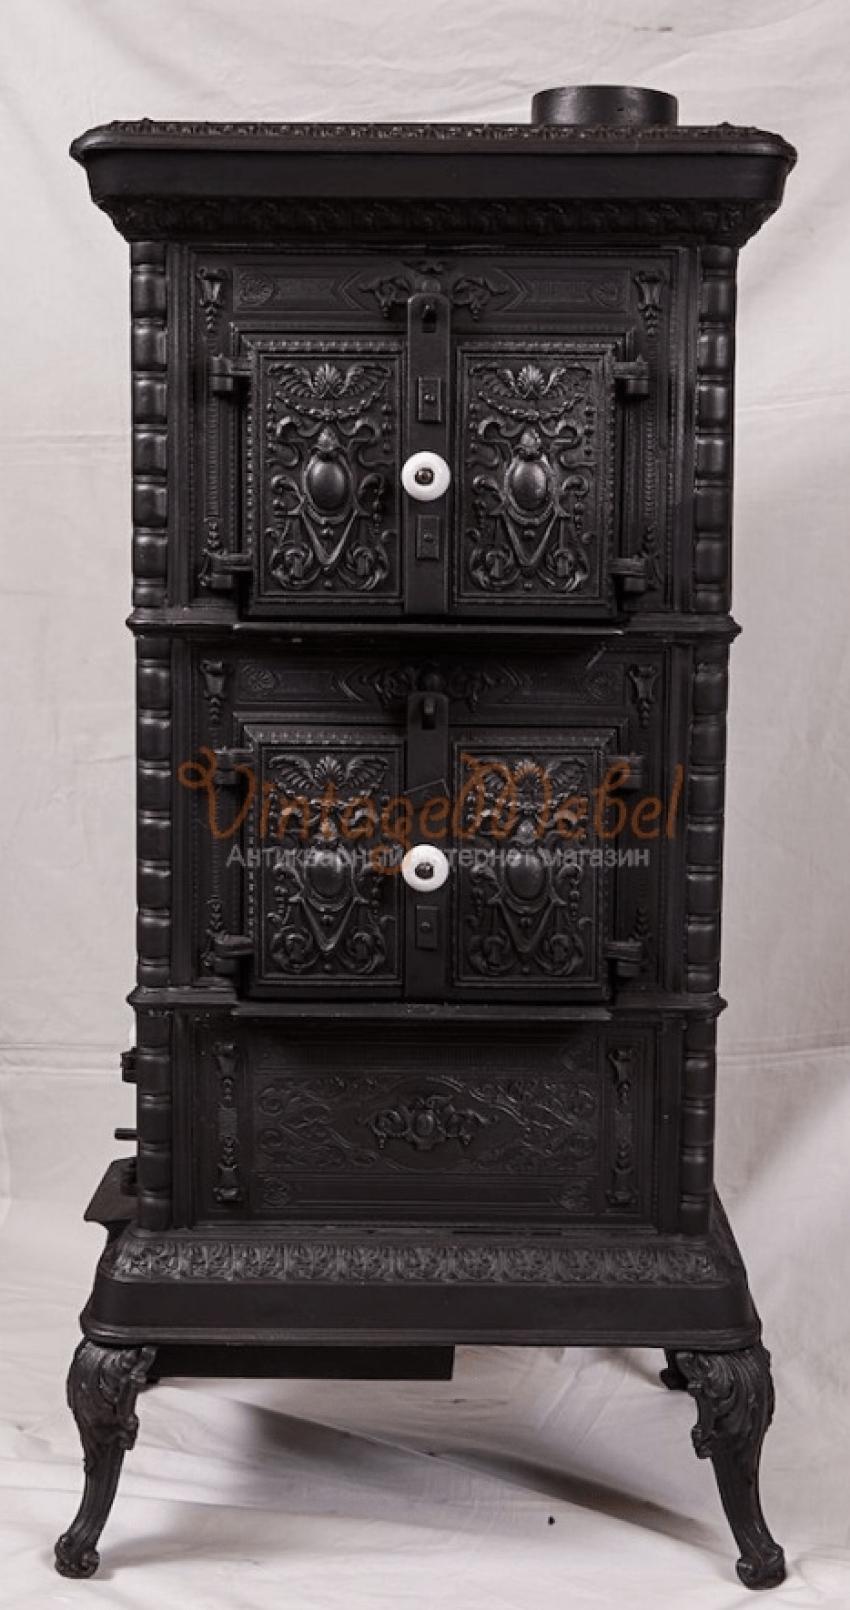 Oven made of cast iron. Czech Republic - photo 1